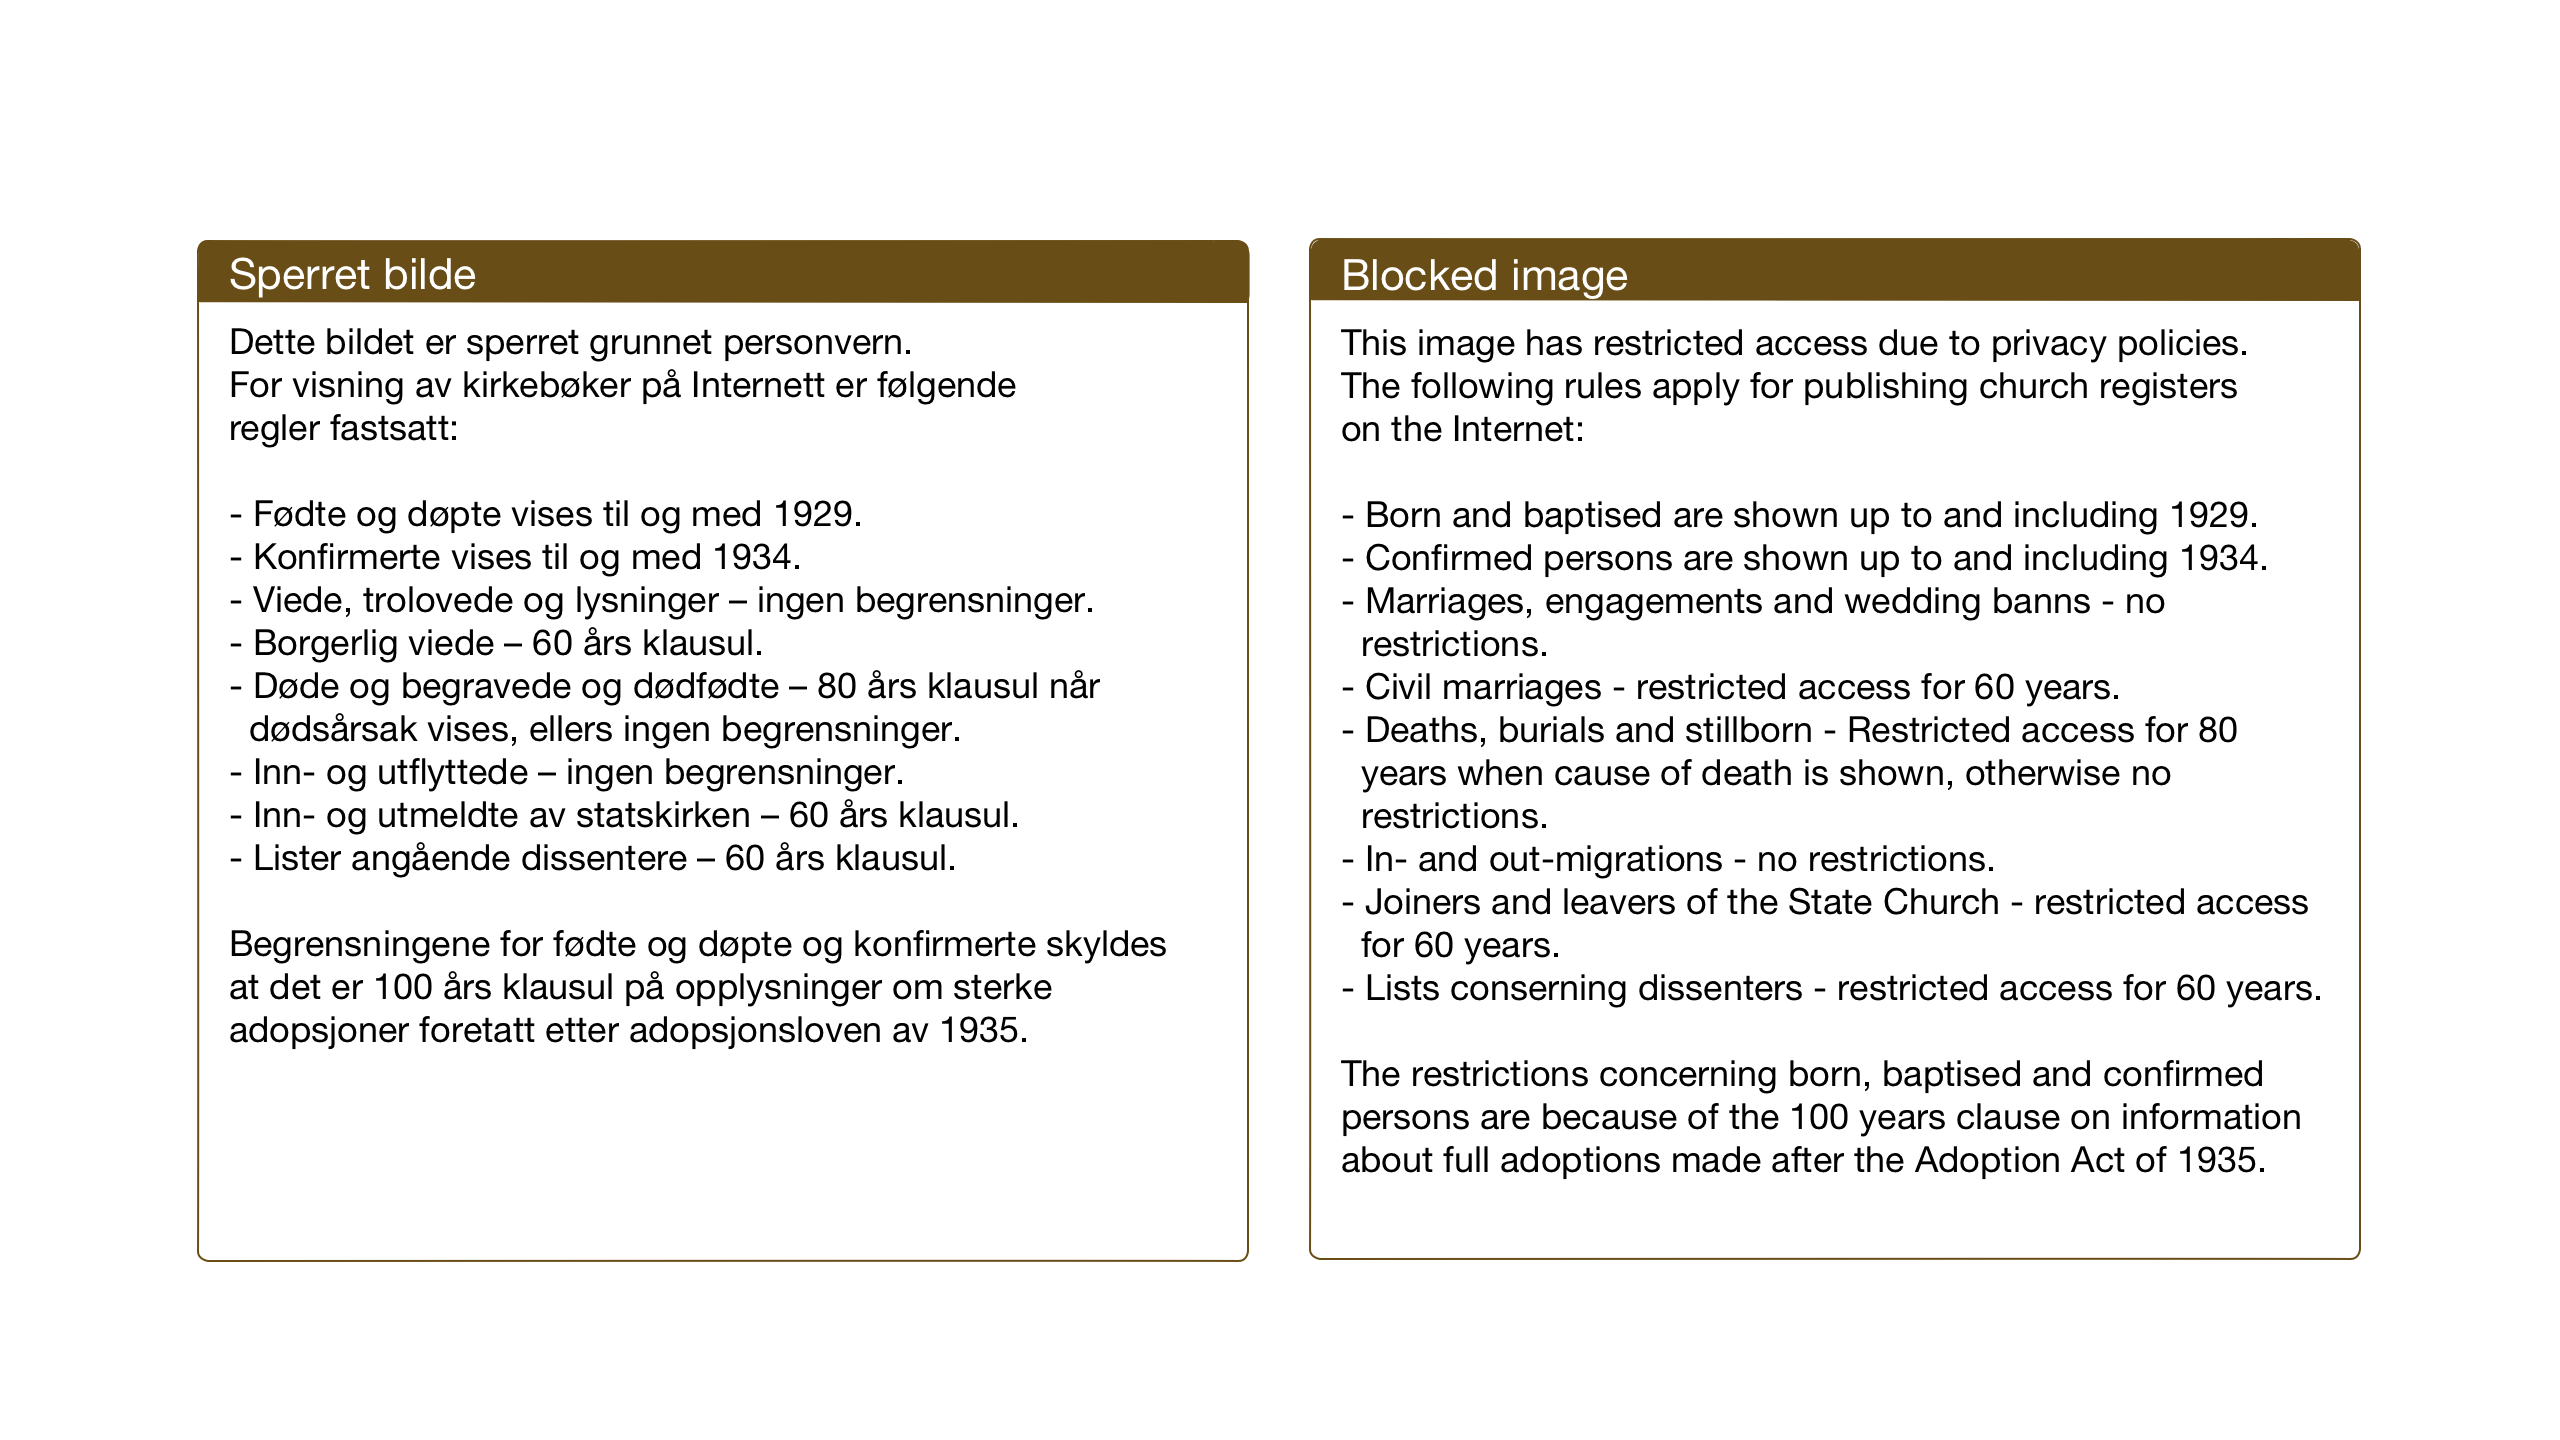 SAH, Vardal prestekontor, H/Ha/Haa/L0018: Ministerialbok nr. 18, 1930-1945, s. 270